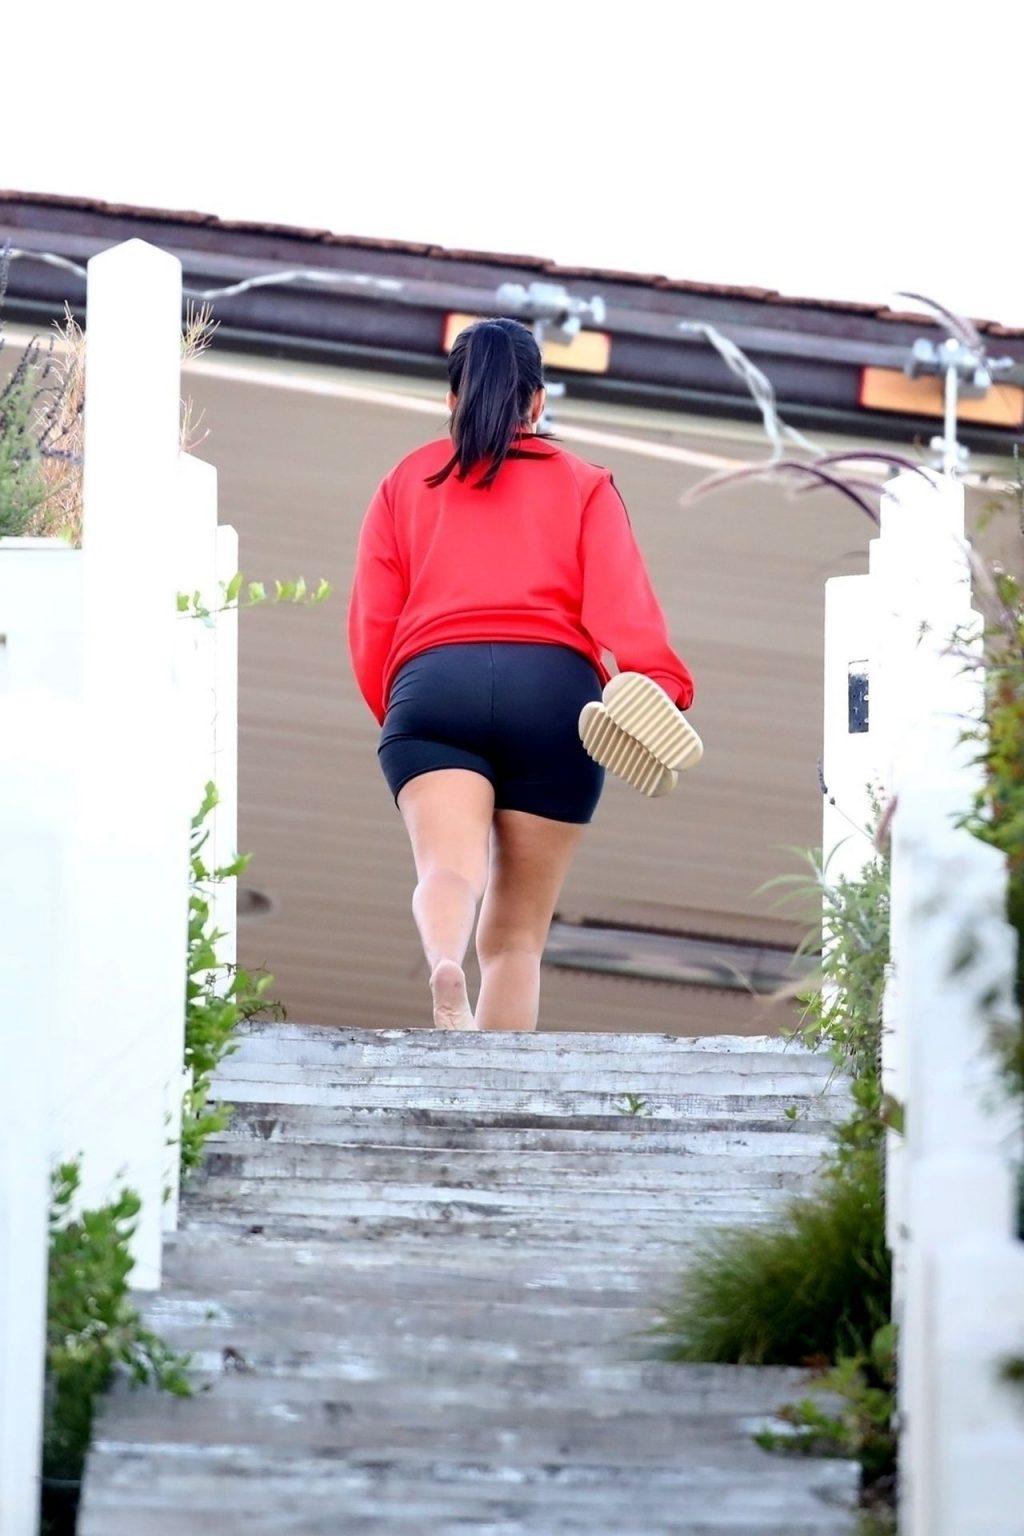 Kourtney Kardashian Celebrates Phil Riportella's Birthday at Her Beach House in Malibu (24 Photos)